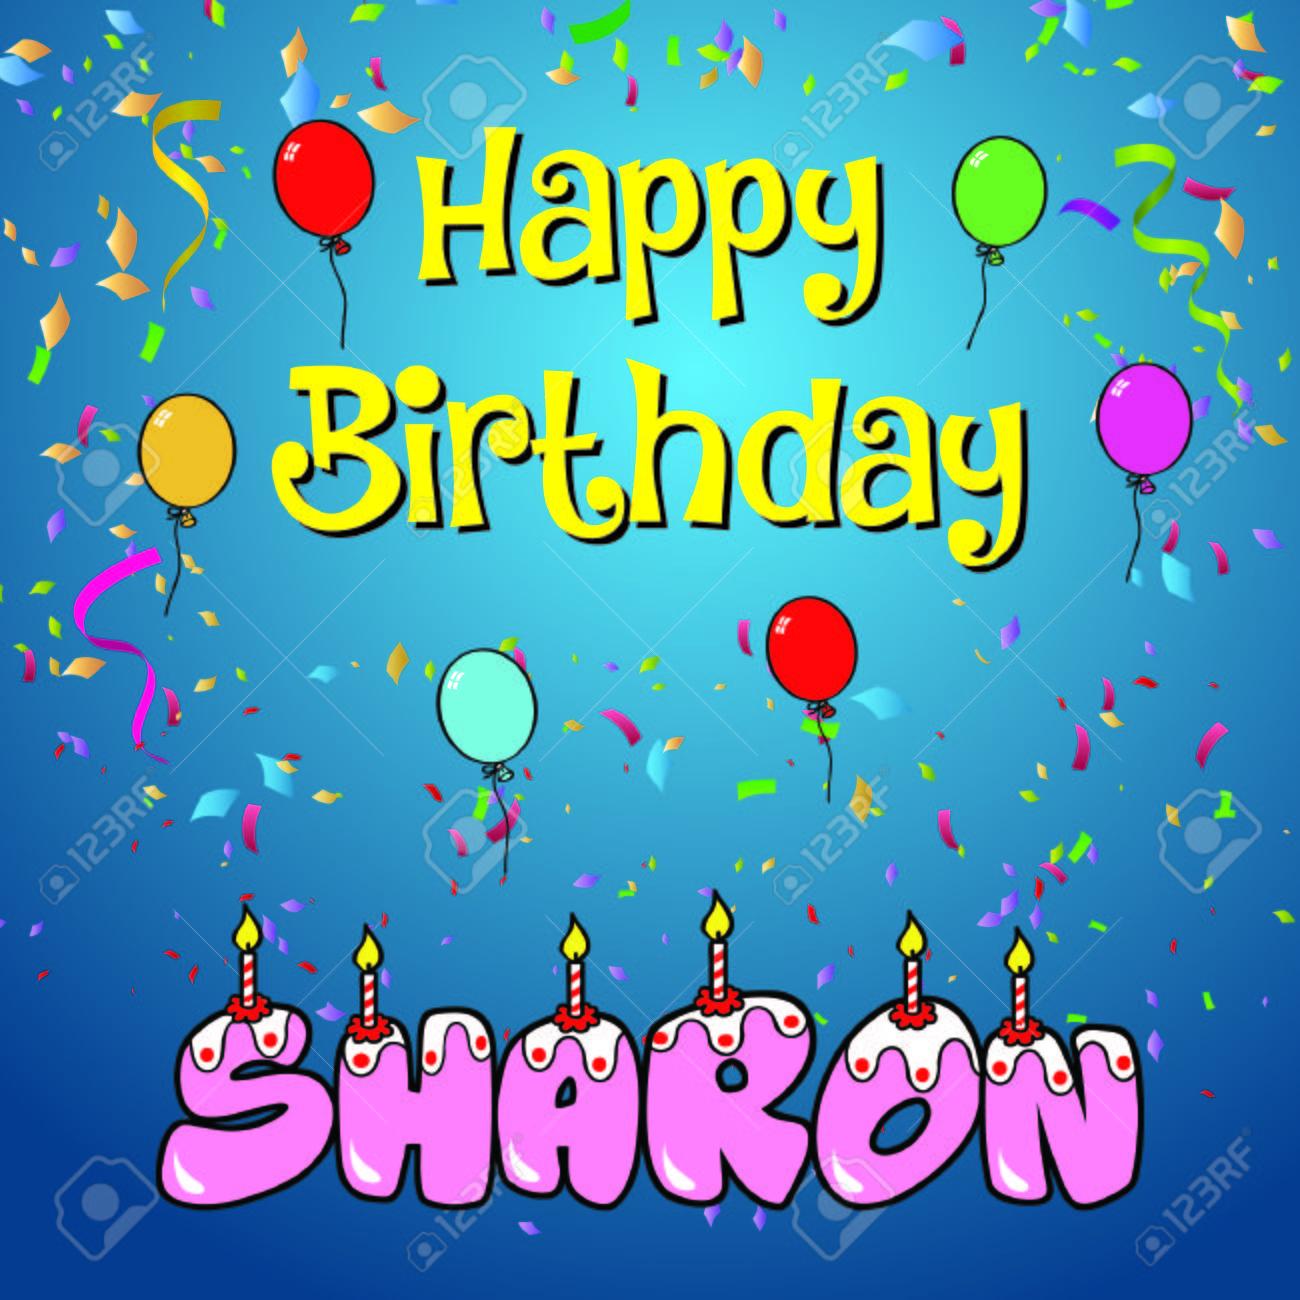 Happy Birthday Sharon Royalty Free Cliparts Vectors And Stock Illustration Image 76572290